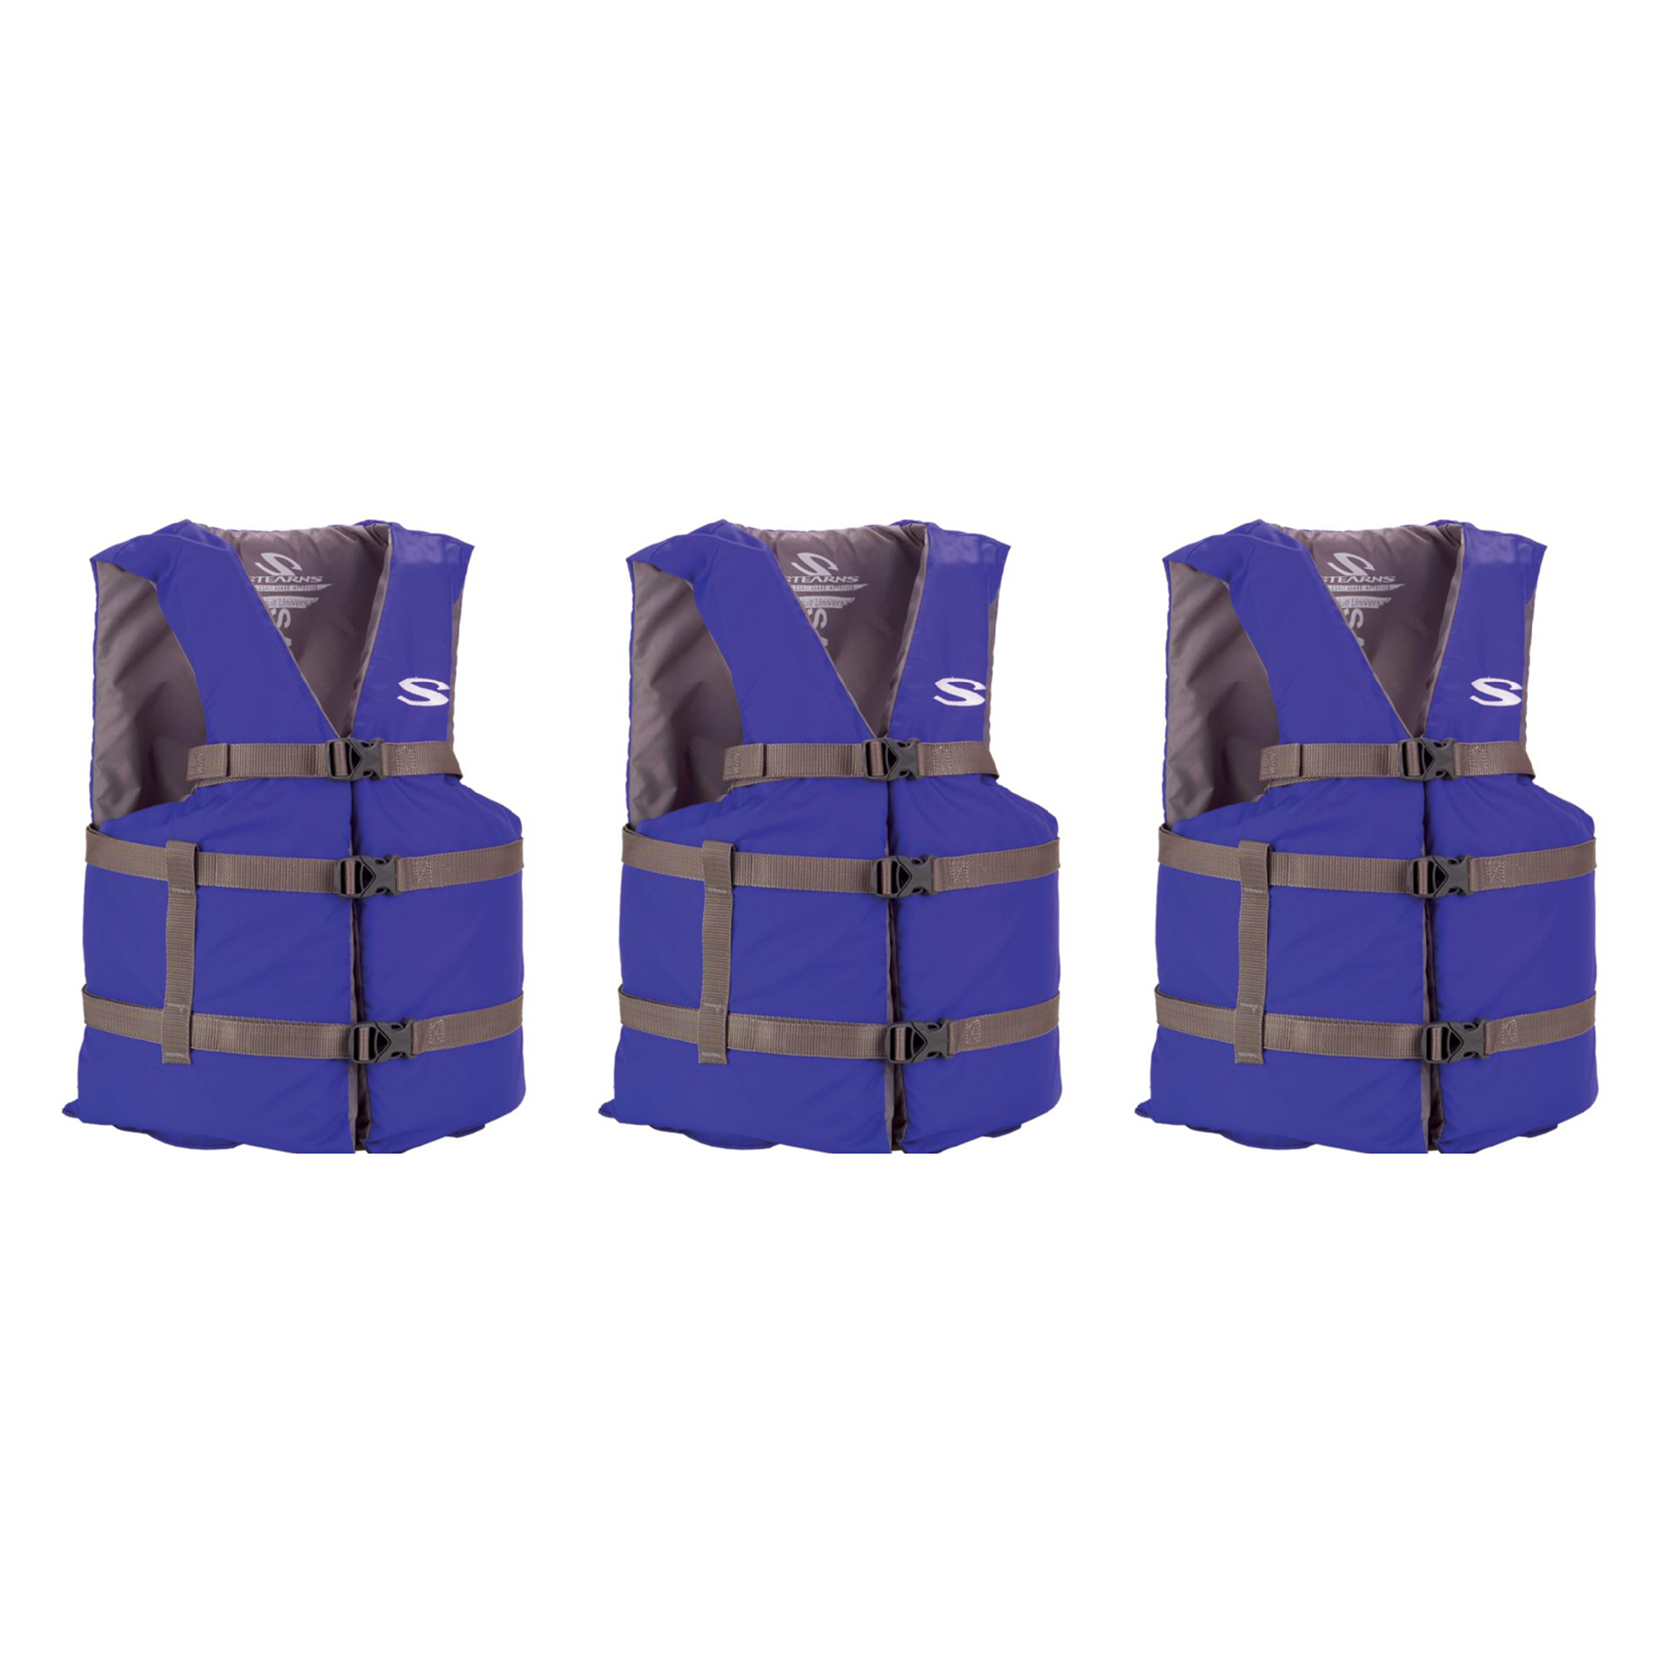 COLEMAN Stearns Adult Classic Universal Life Jacket Flotation Boating Vest BLUE